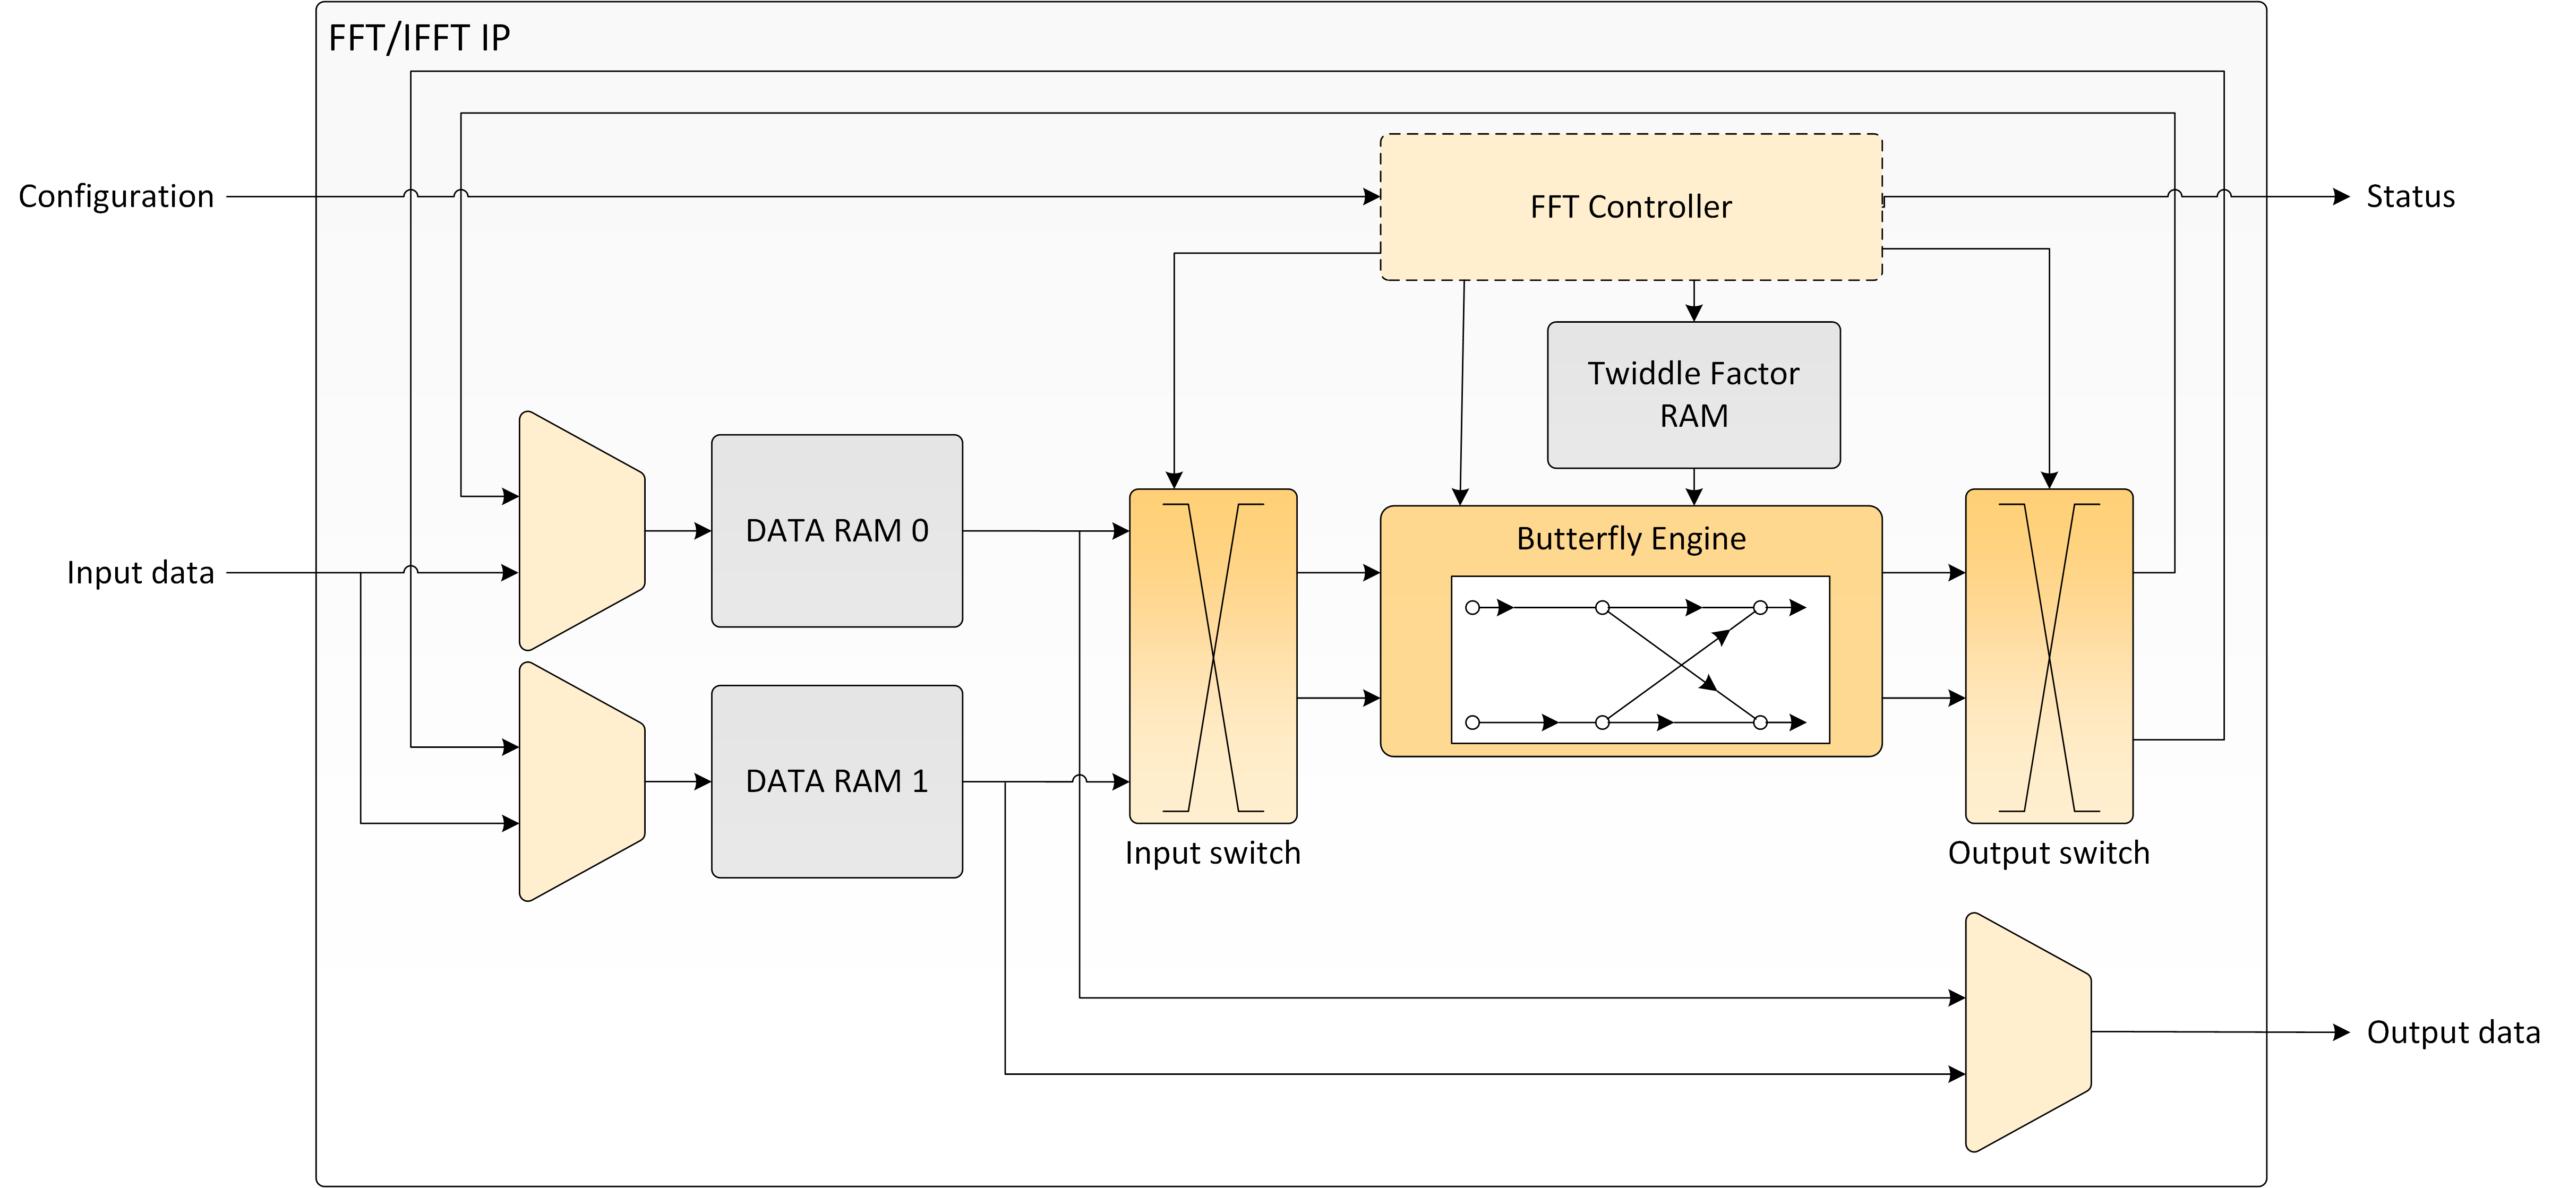 Radix-2 FFT Block Diagram